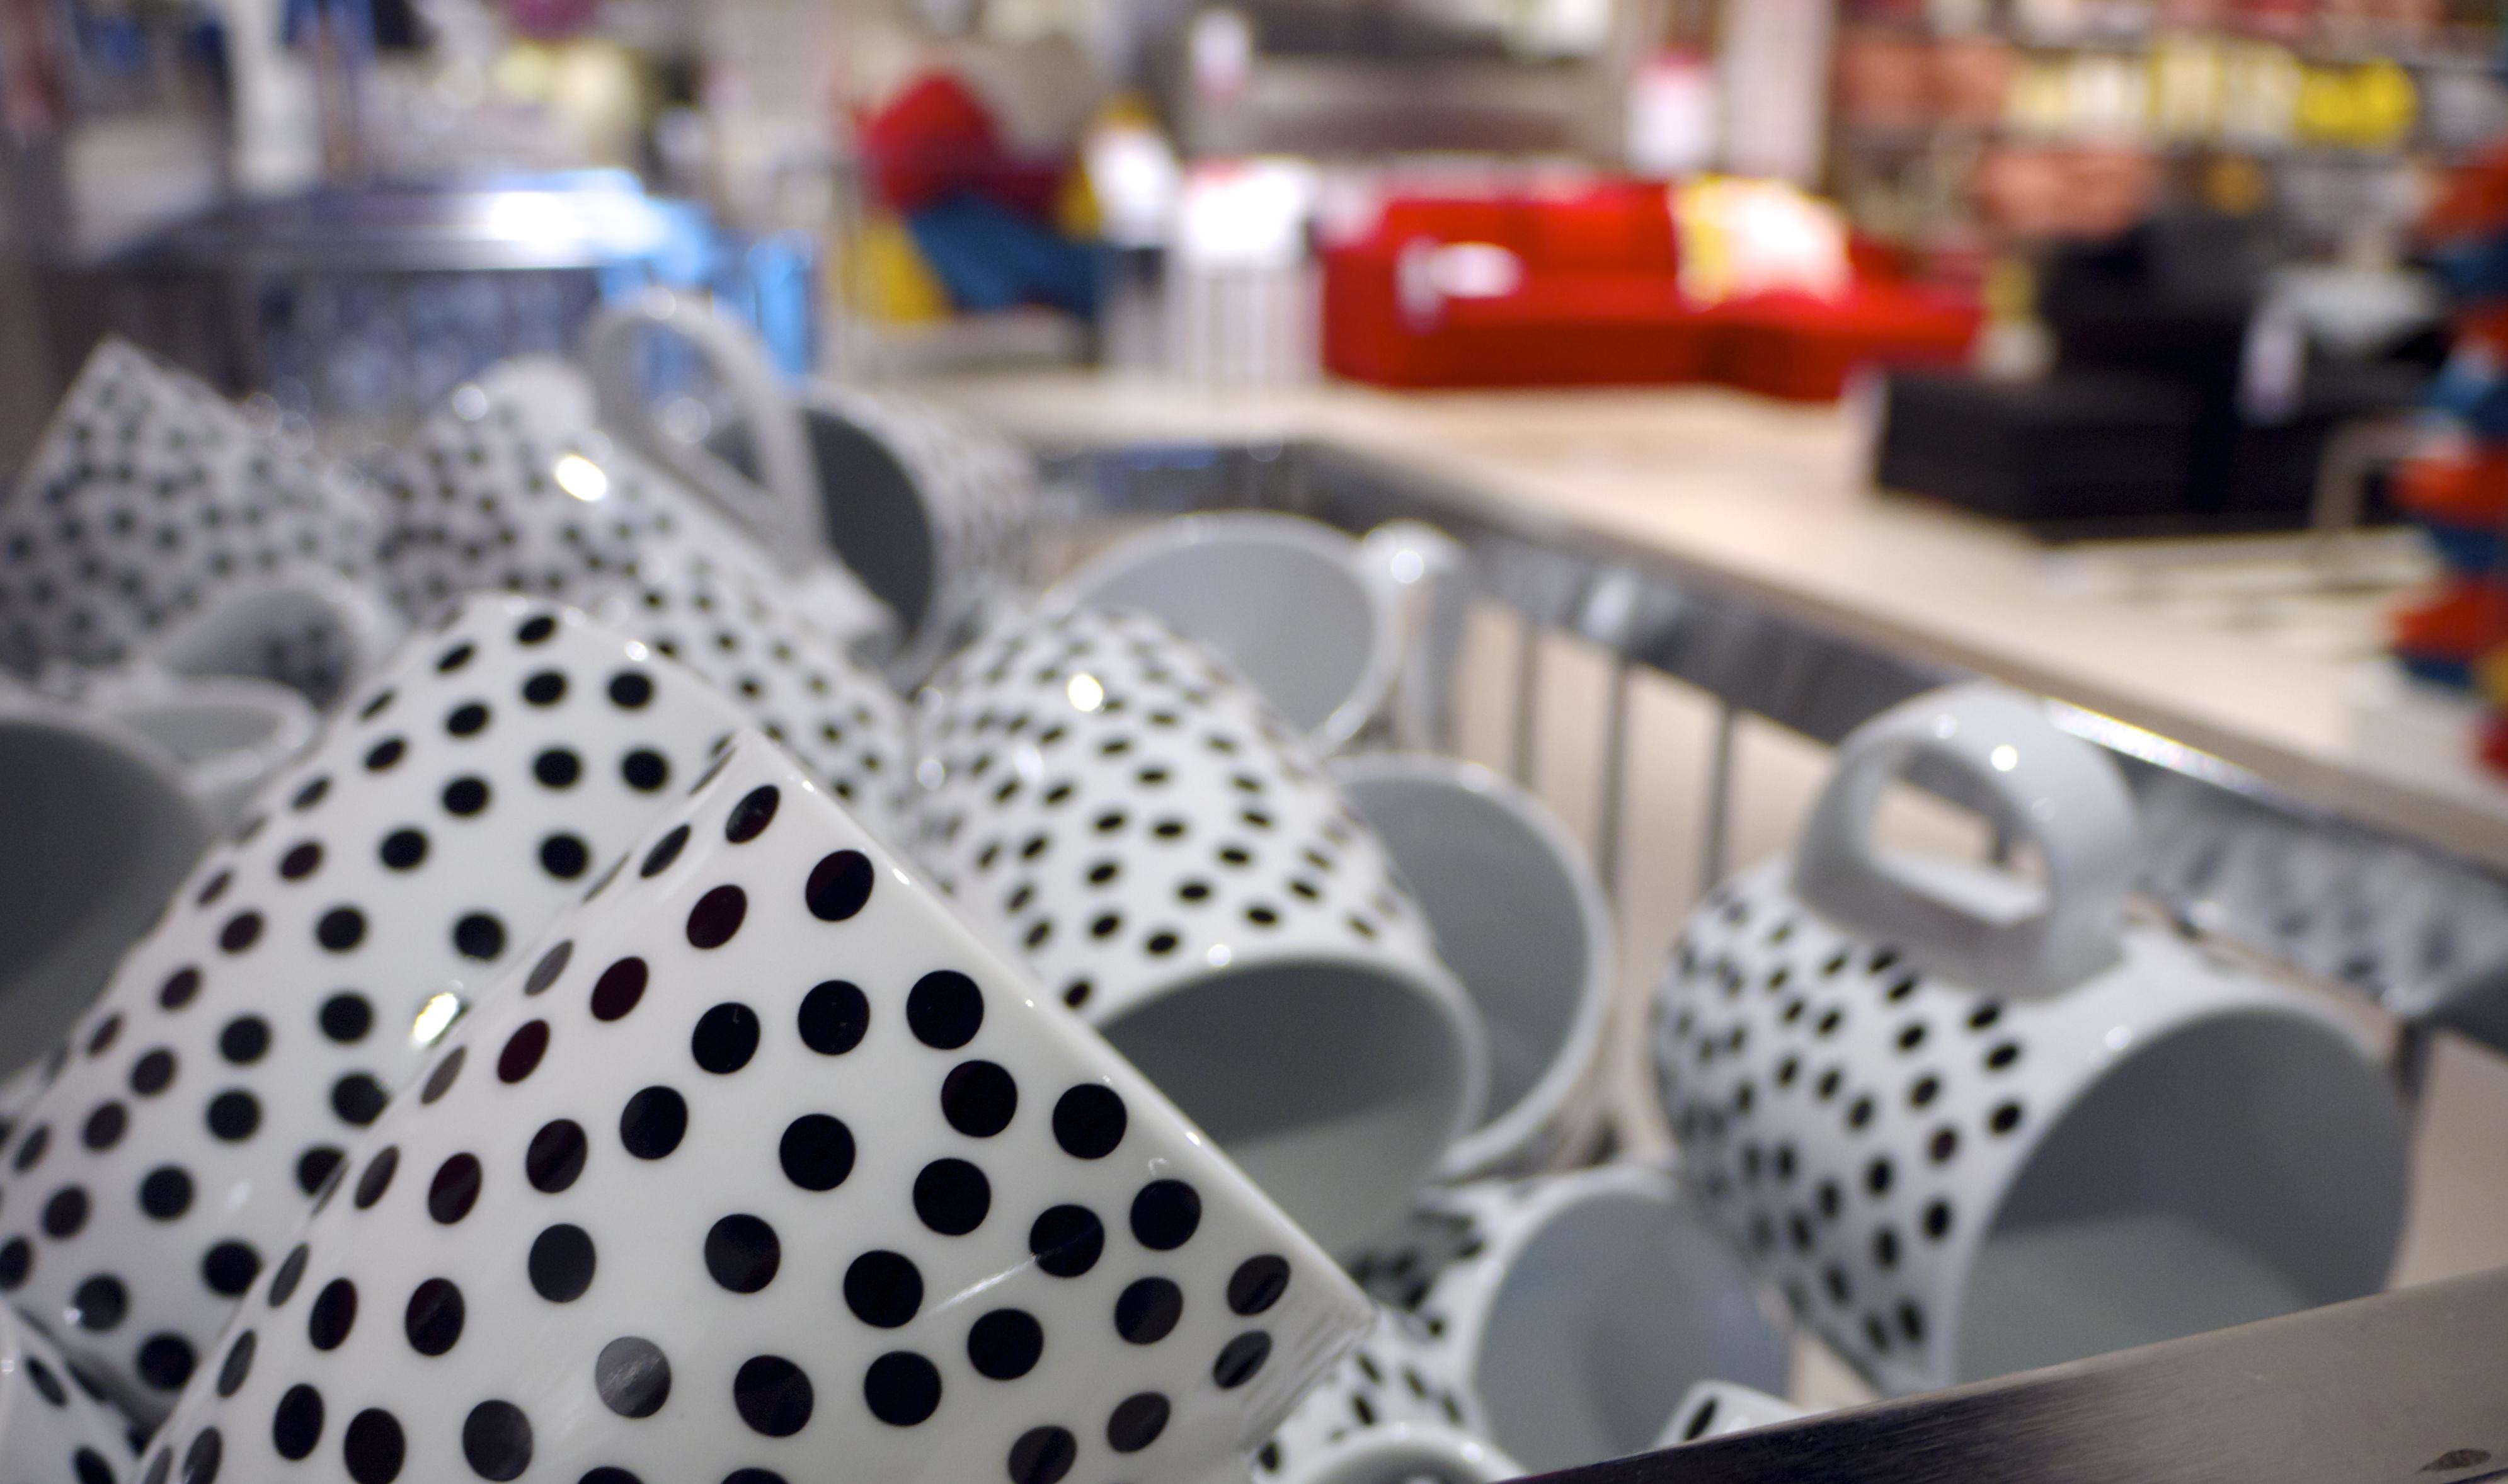 Polka Dot Mugs from Freedom